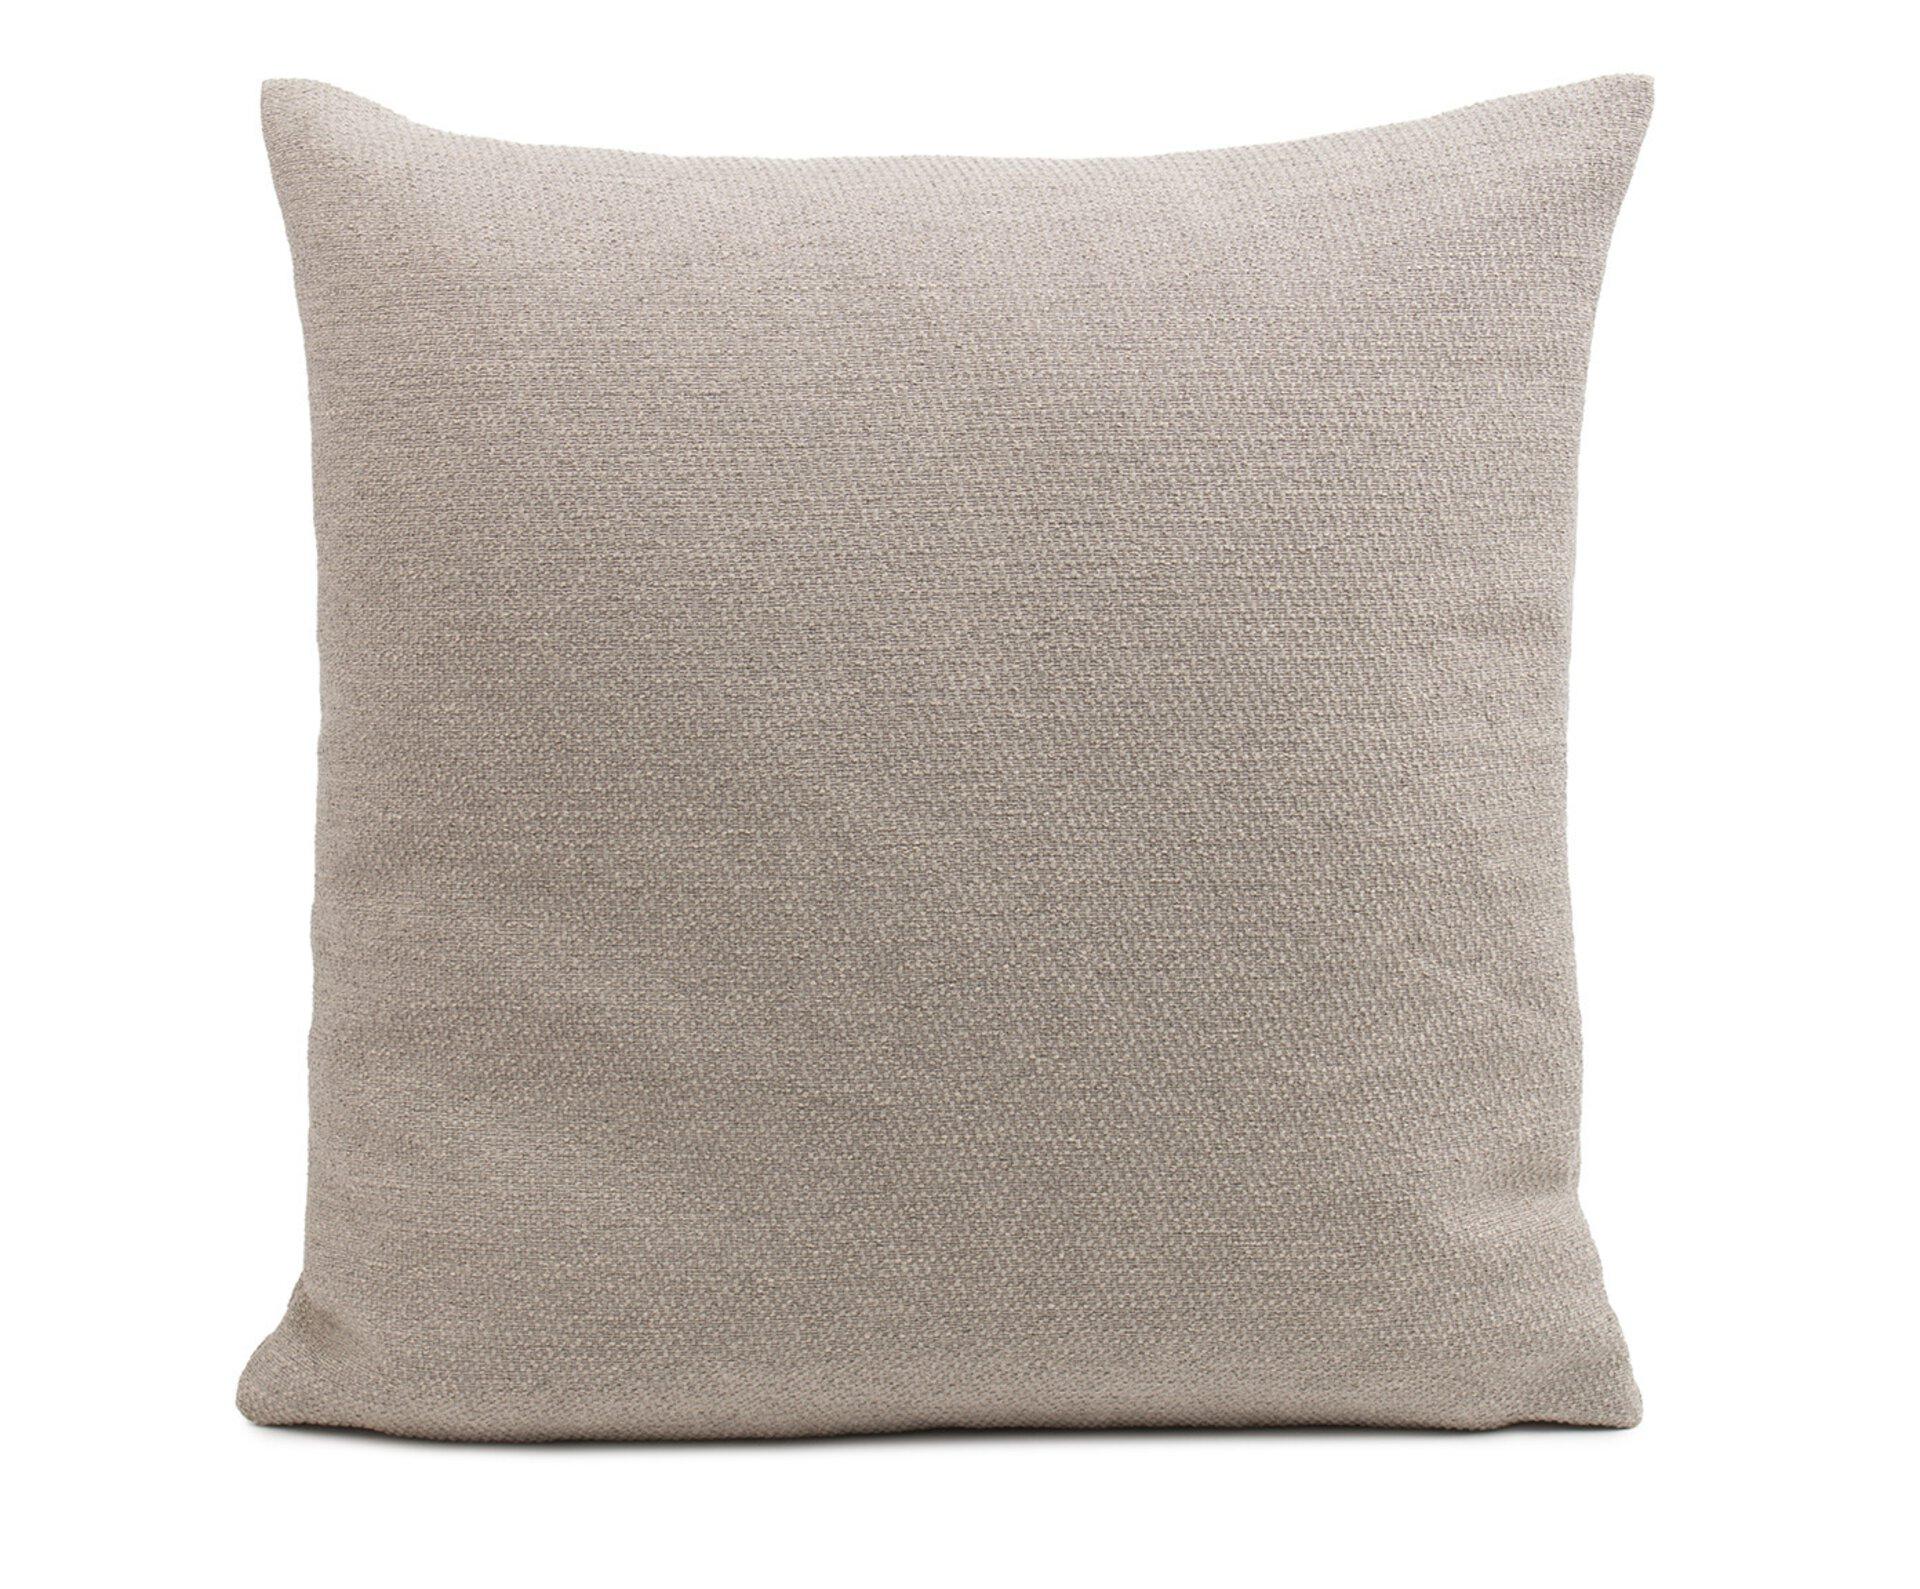 Kissenhülle Fabricio Ambiente Trendlife Textil braun 60 x 60 cm